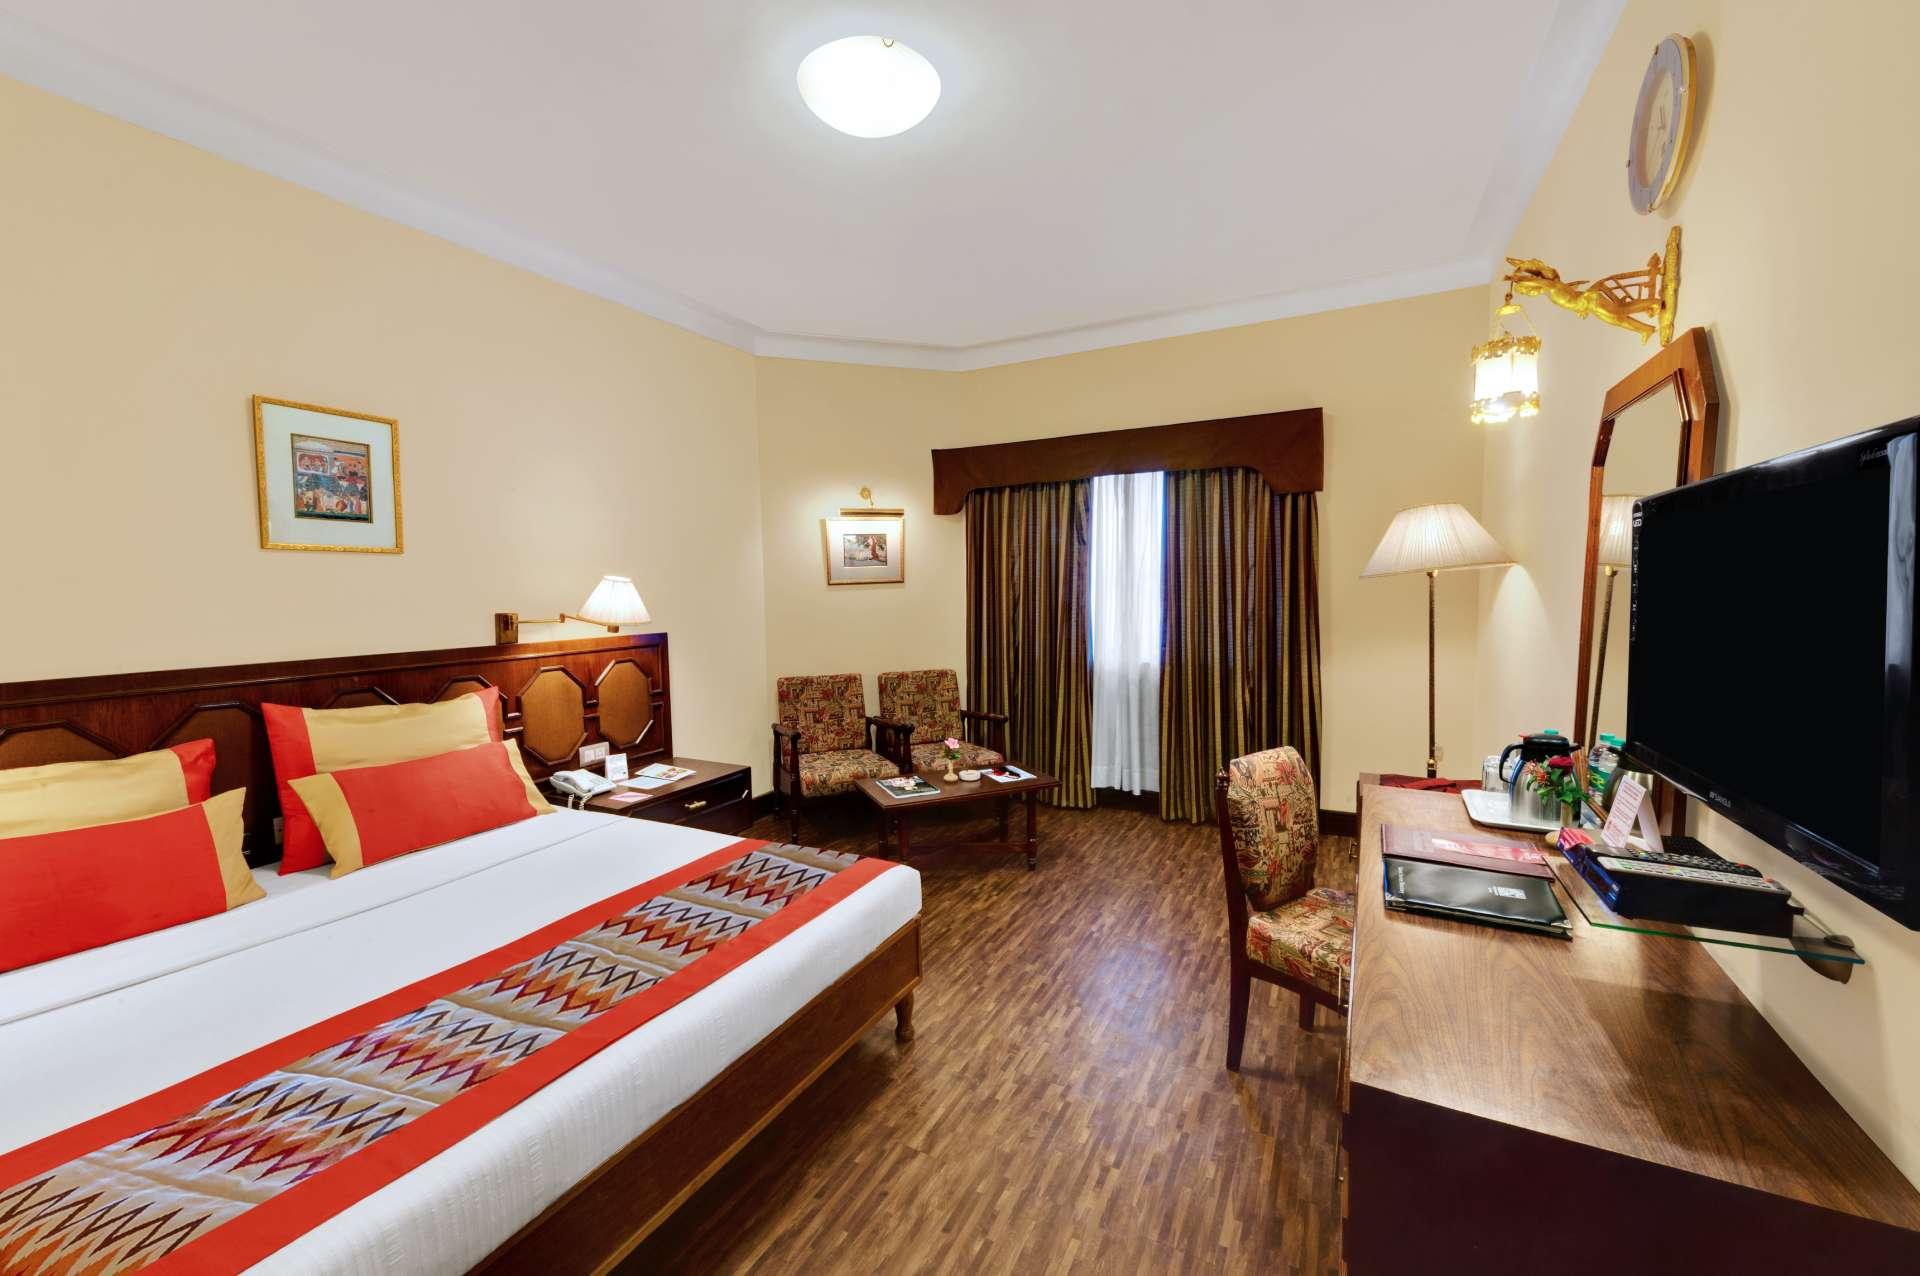 deluxe room 2 ambassador ajanta aurangabad - The Ambassador | Heritage Hotels in Mumbai, Aurangabad, Chennai - Deluxe Room